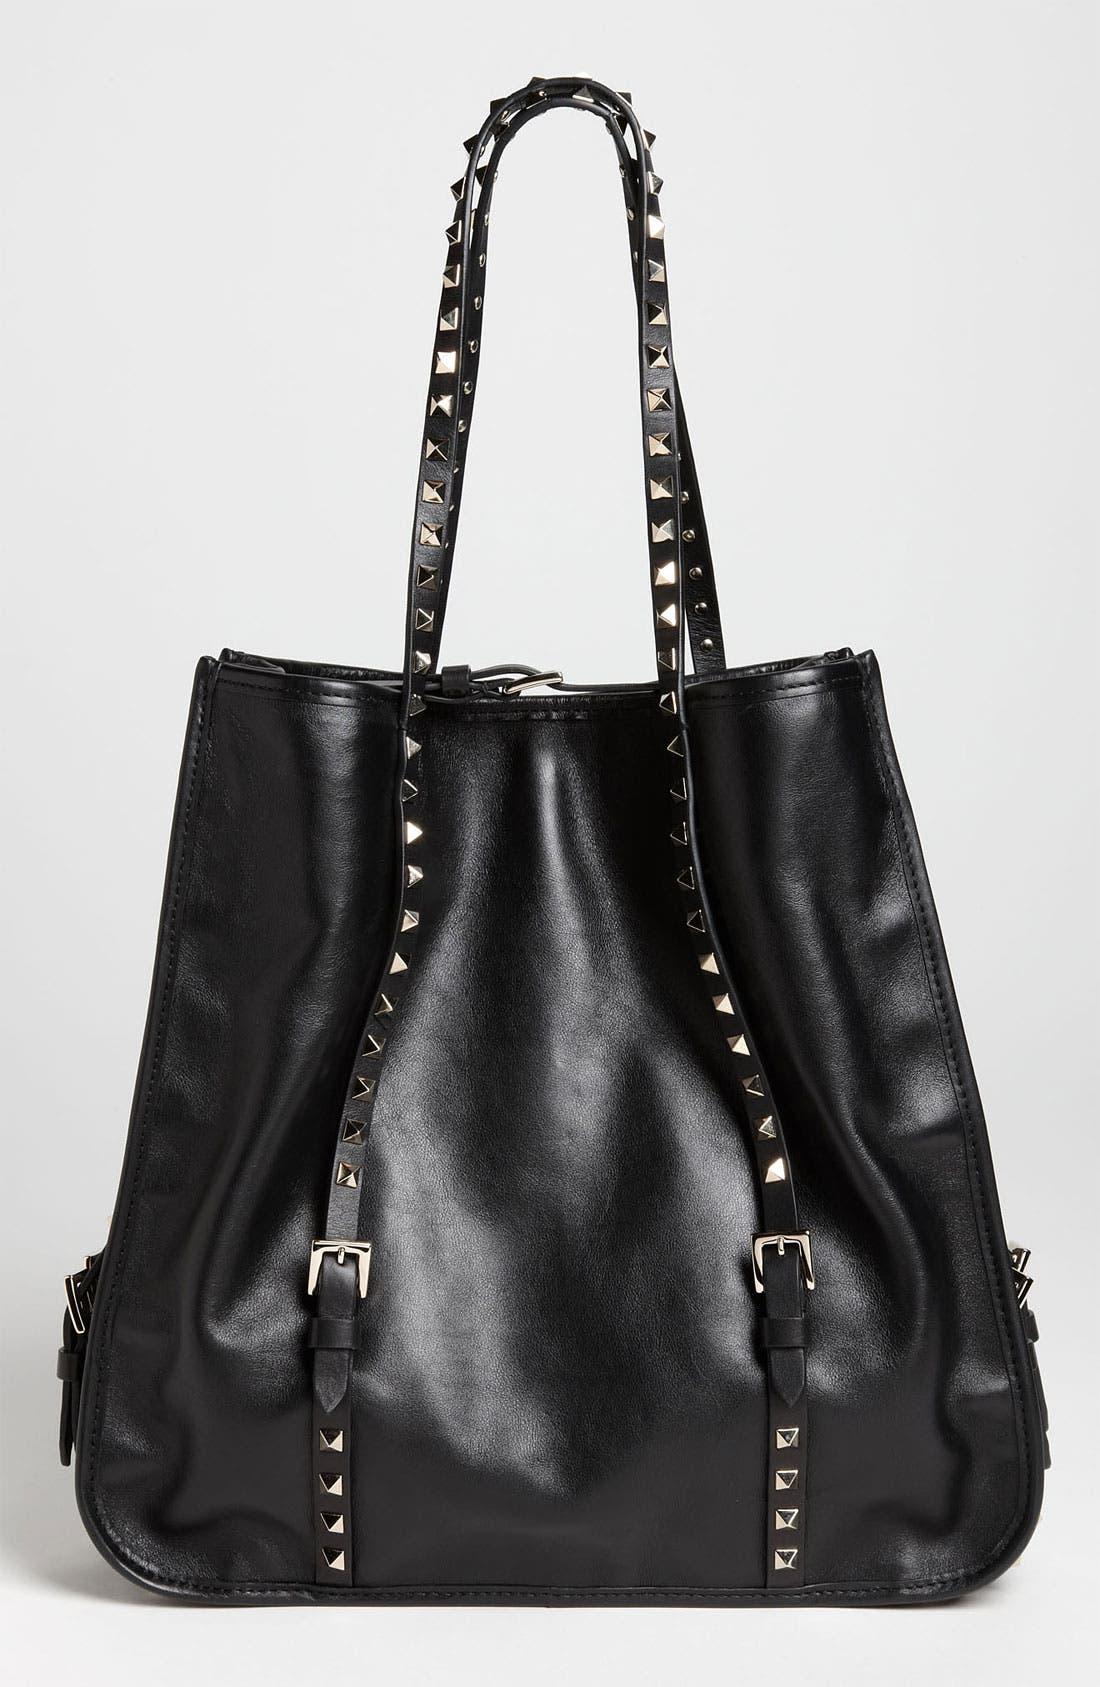 Main Image - Valentino 'Rockstud' Leather Shopper Tote